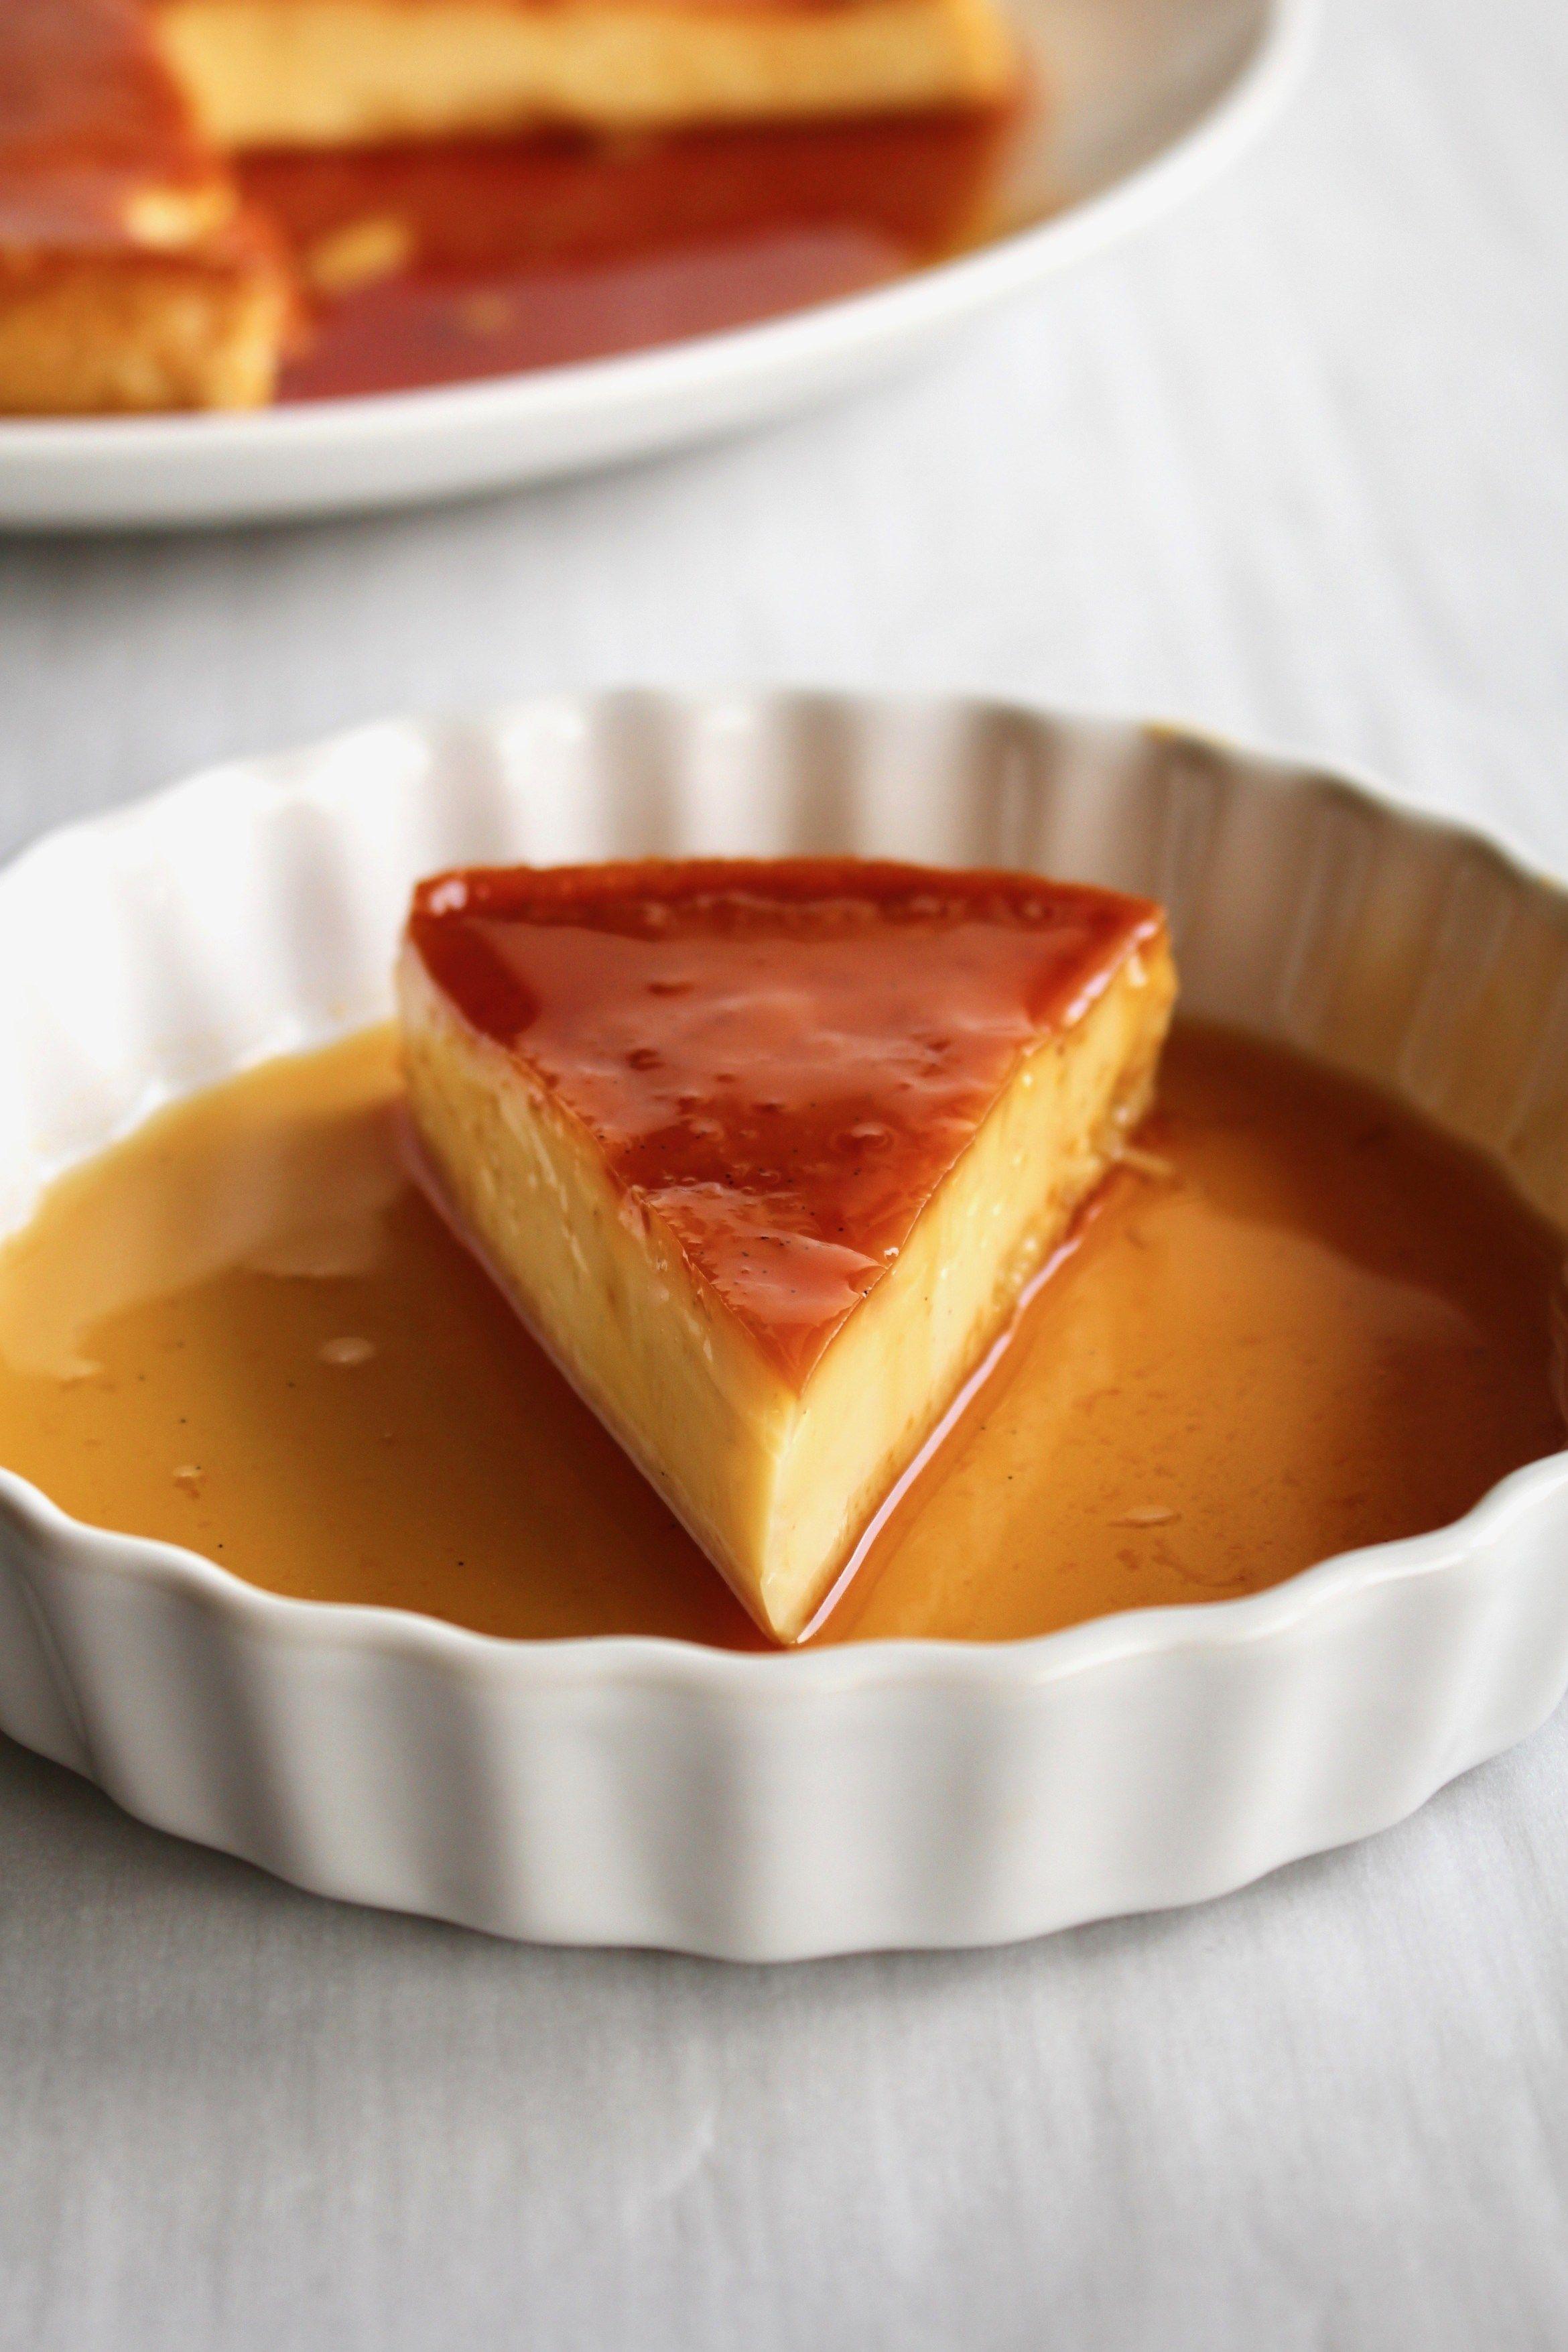 Leche Flan (Dairy-free Filipino dessert) – Ai made it for you